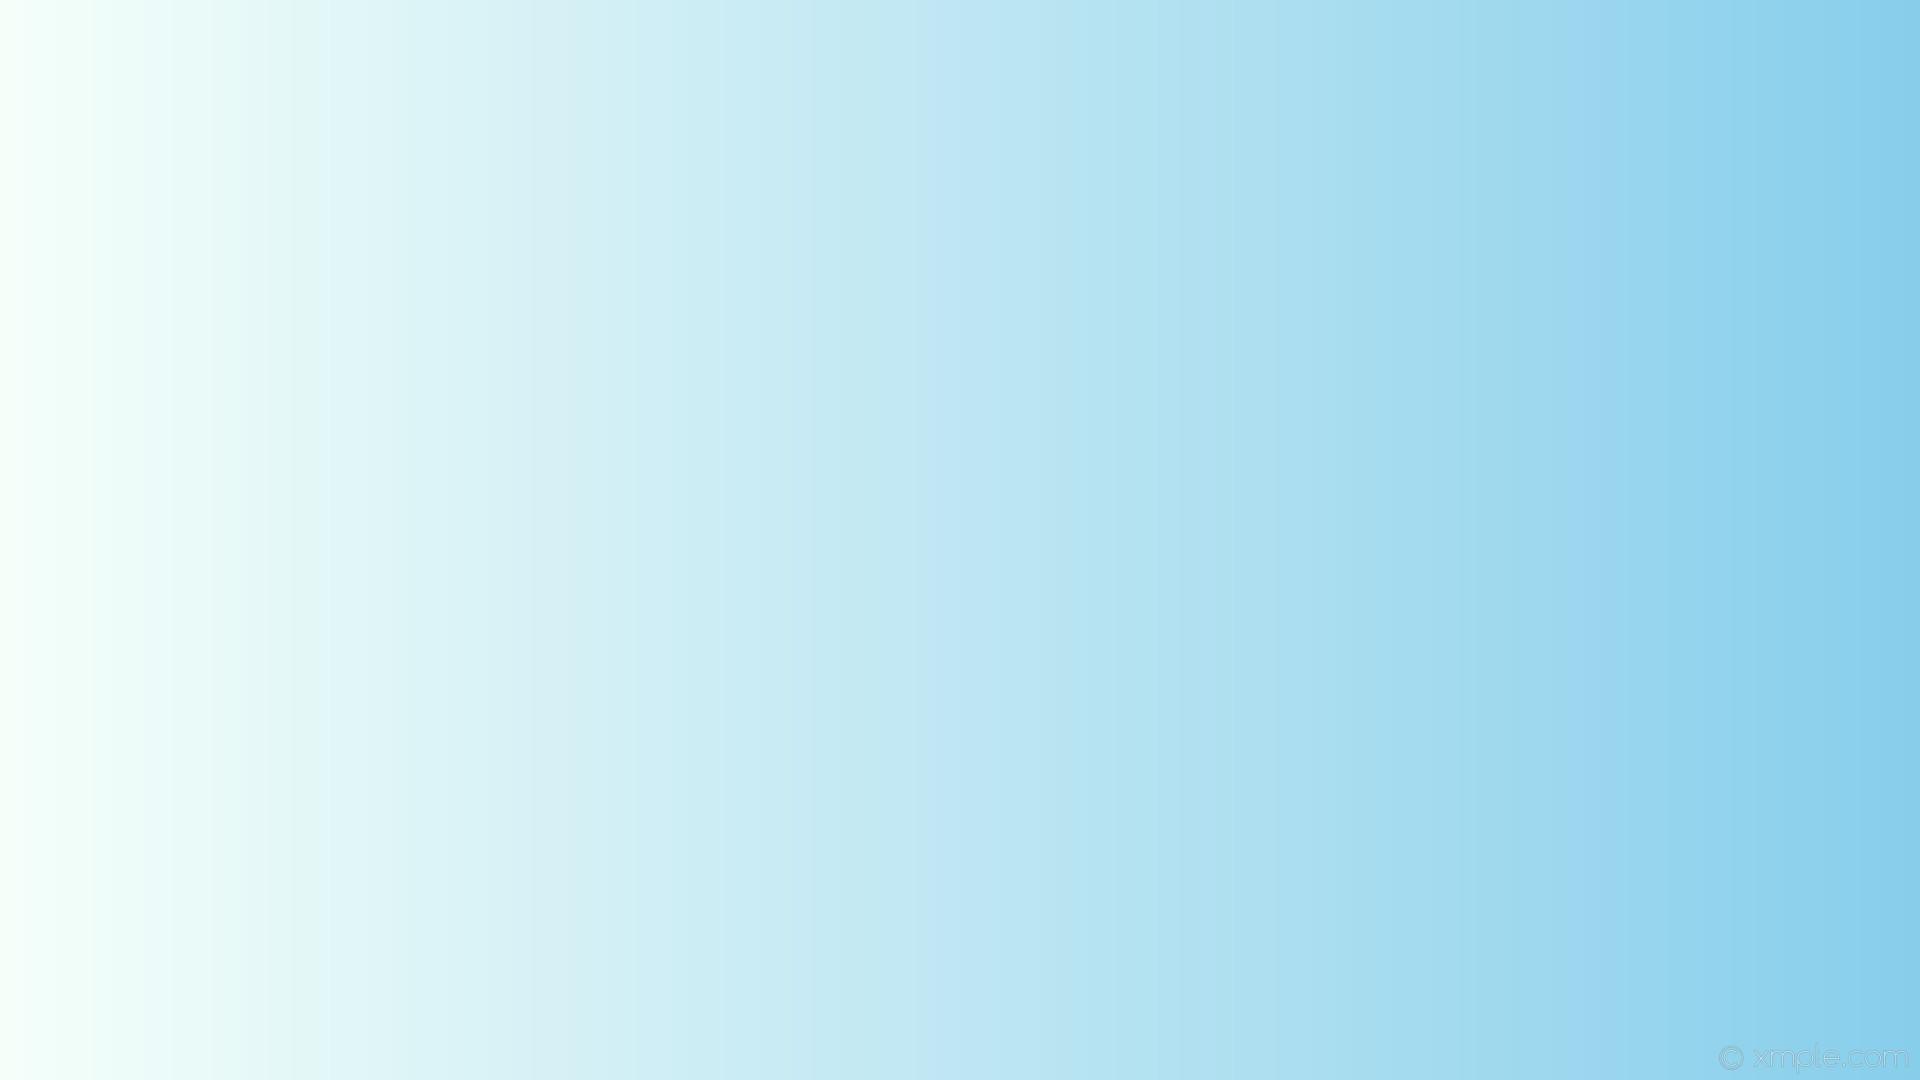 wallpaper gradient white blue linear sky blue mint cream #87ceeb #f5fffa 0°